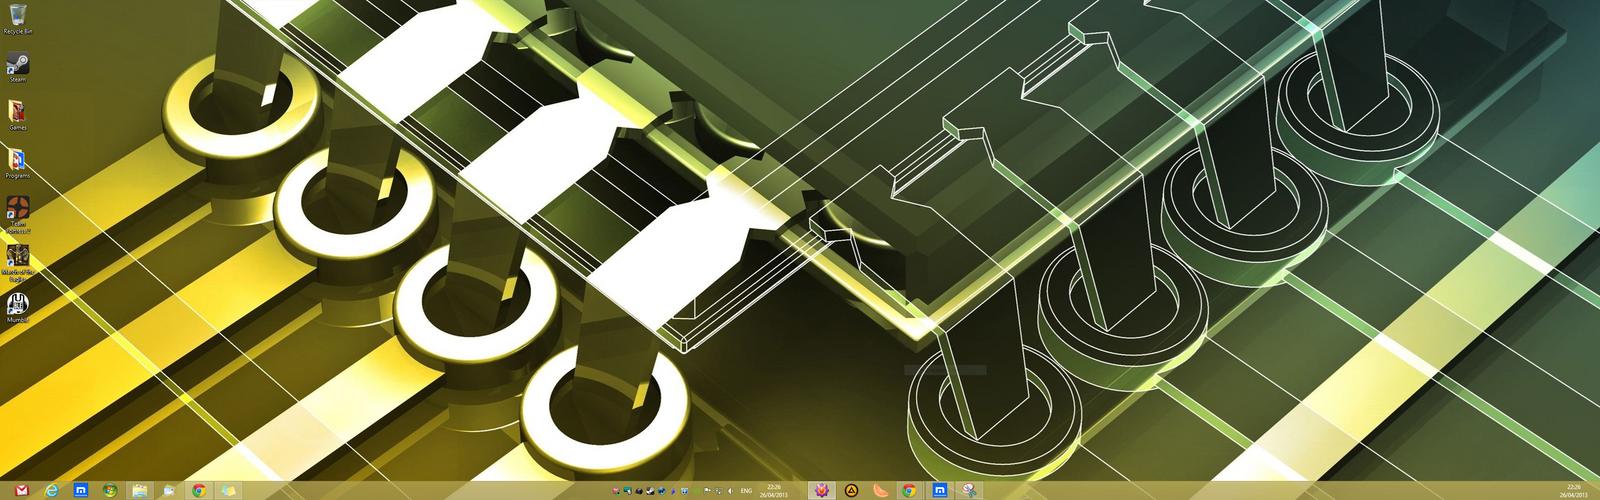 Desktop April 2013 by swarfega